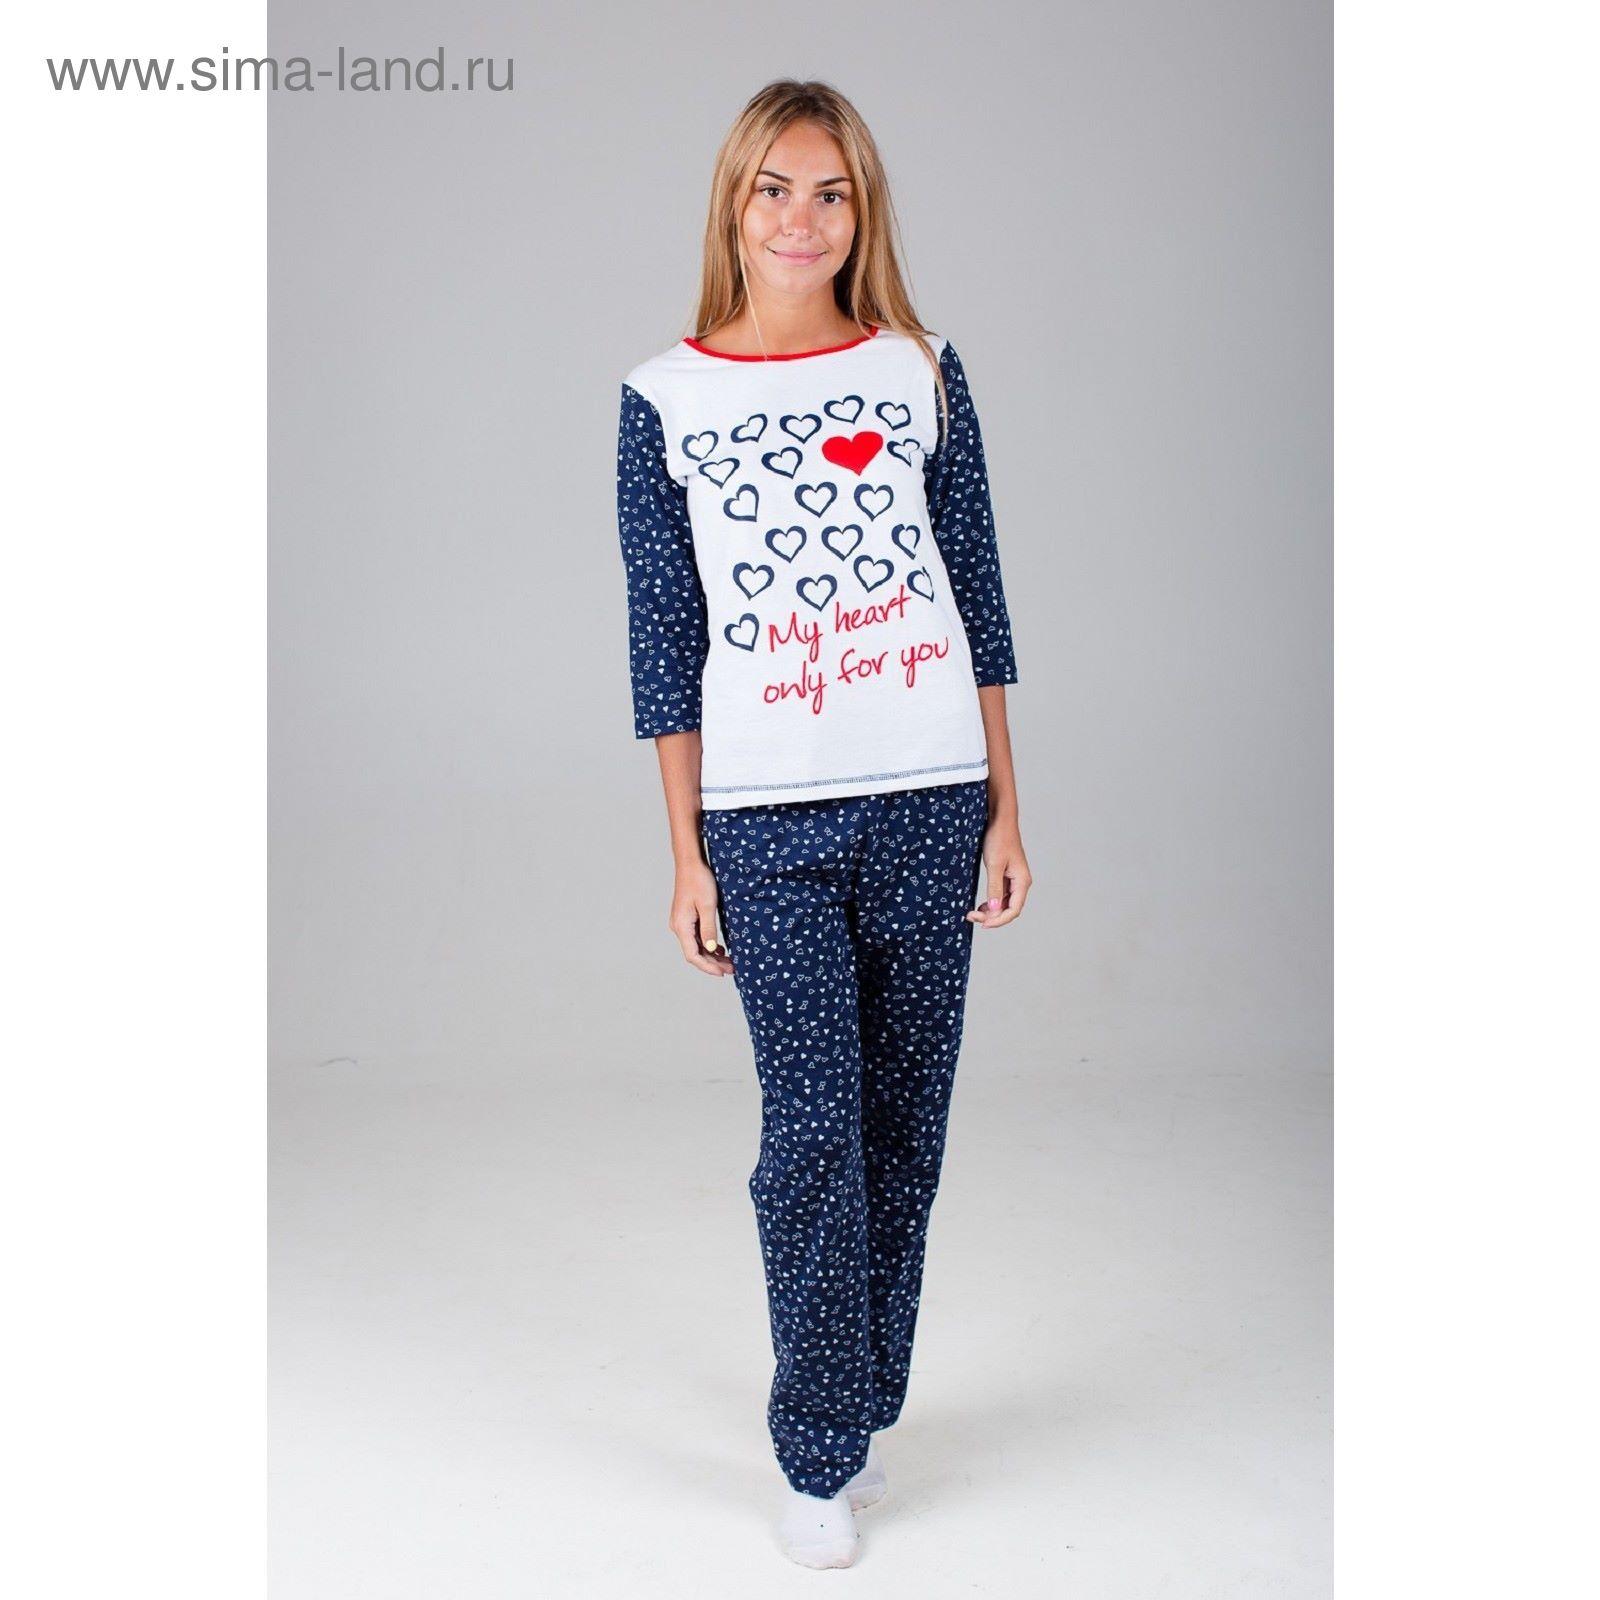 Пижама женская (кофта 9e9fefc758d66